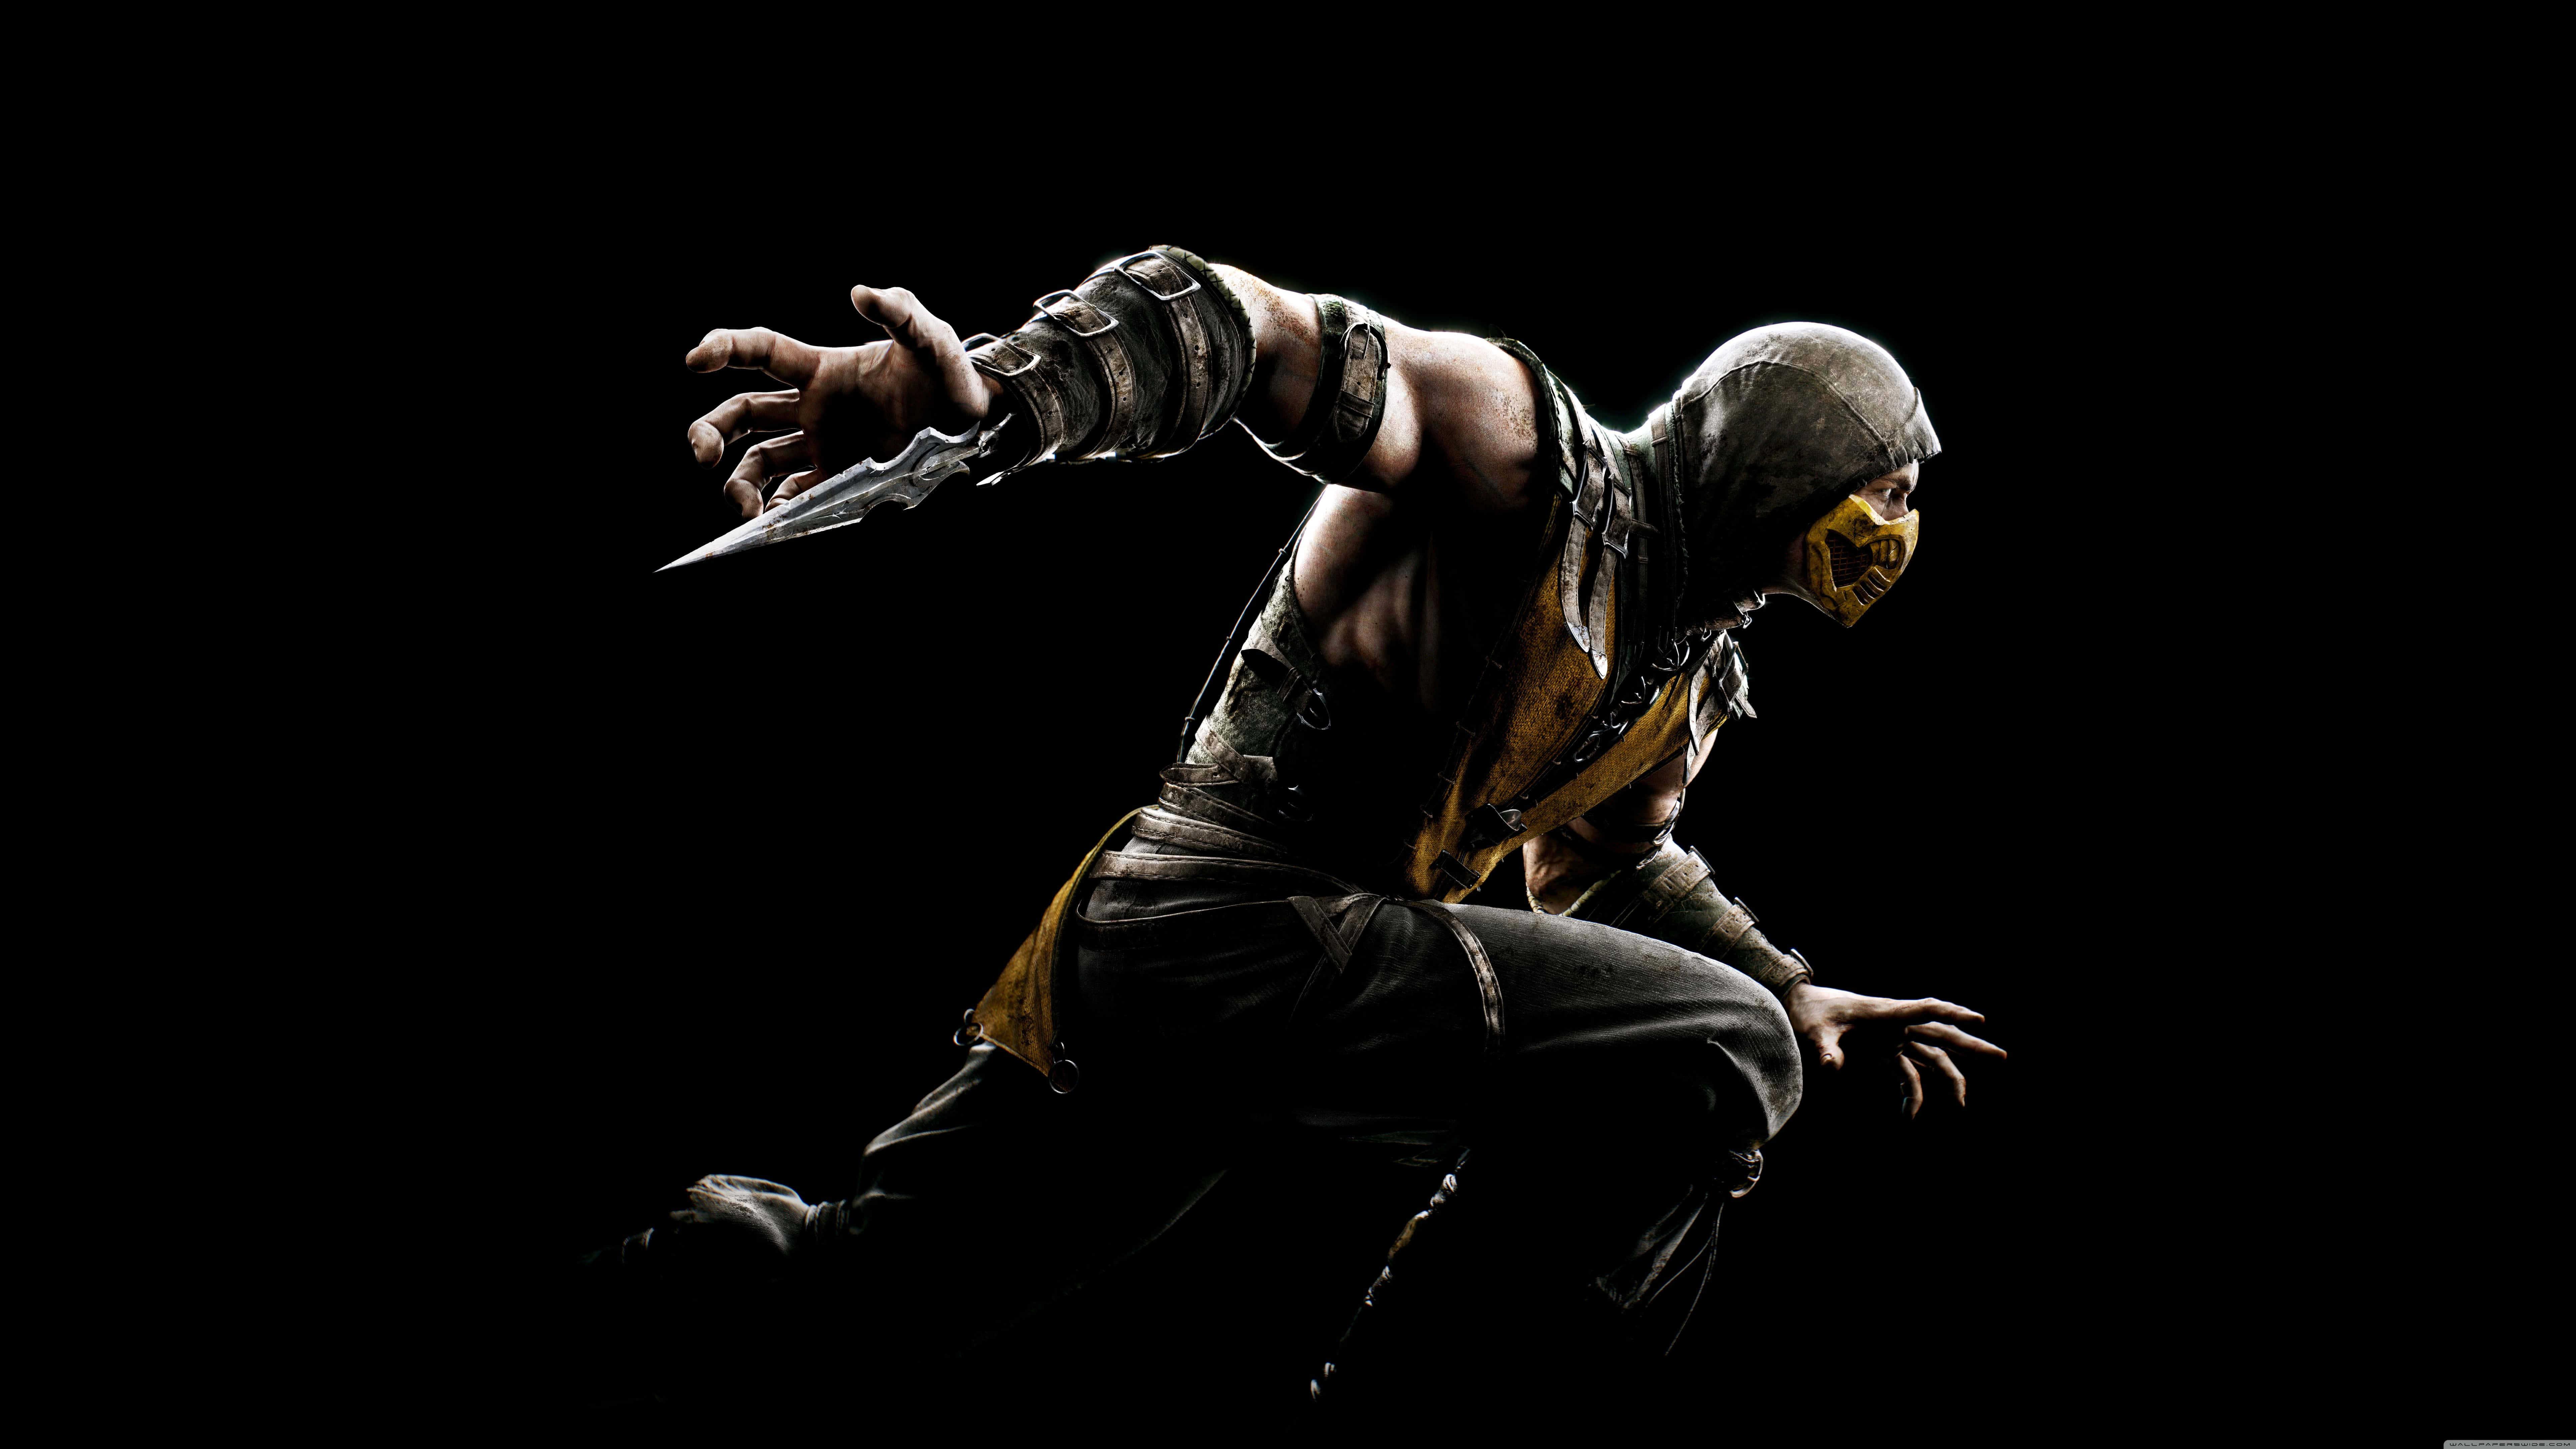 Mortal Kombat X Scorpion UHD 8K Wallpaper Pixelz 7680x4320